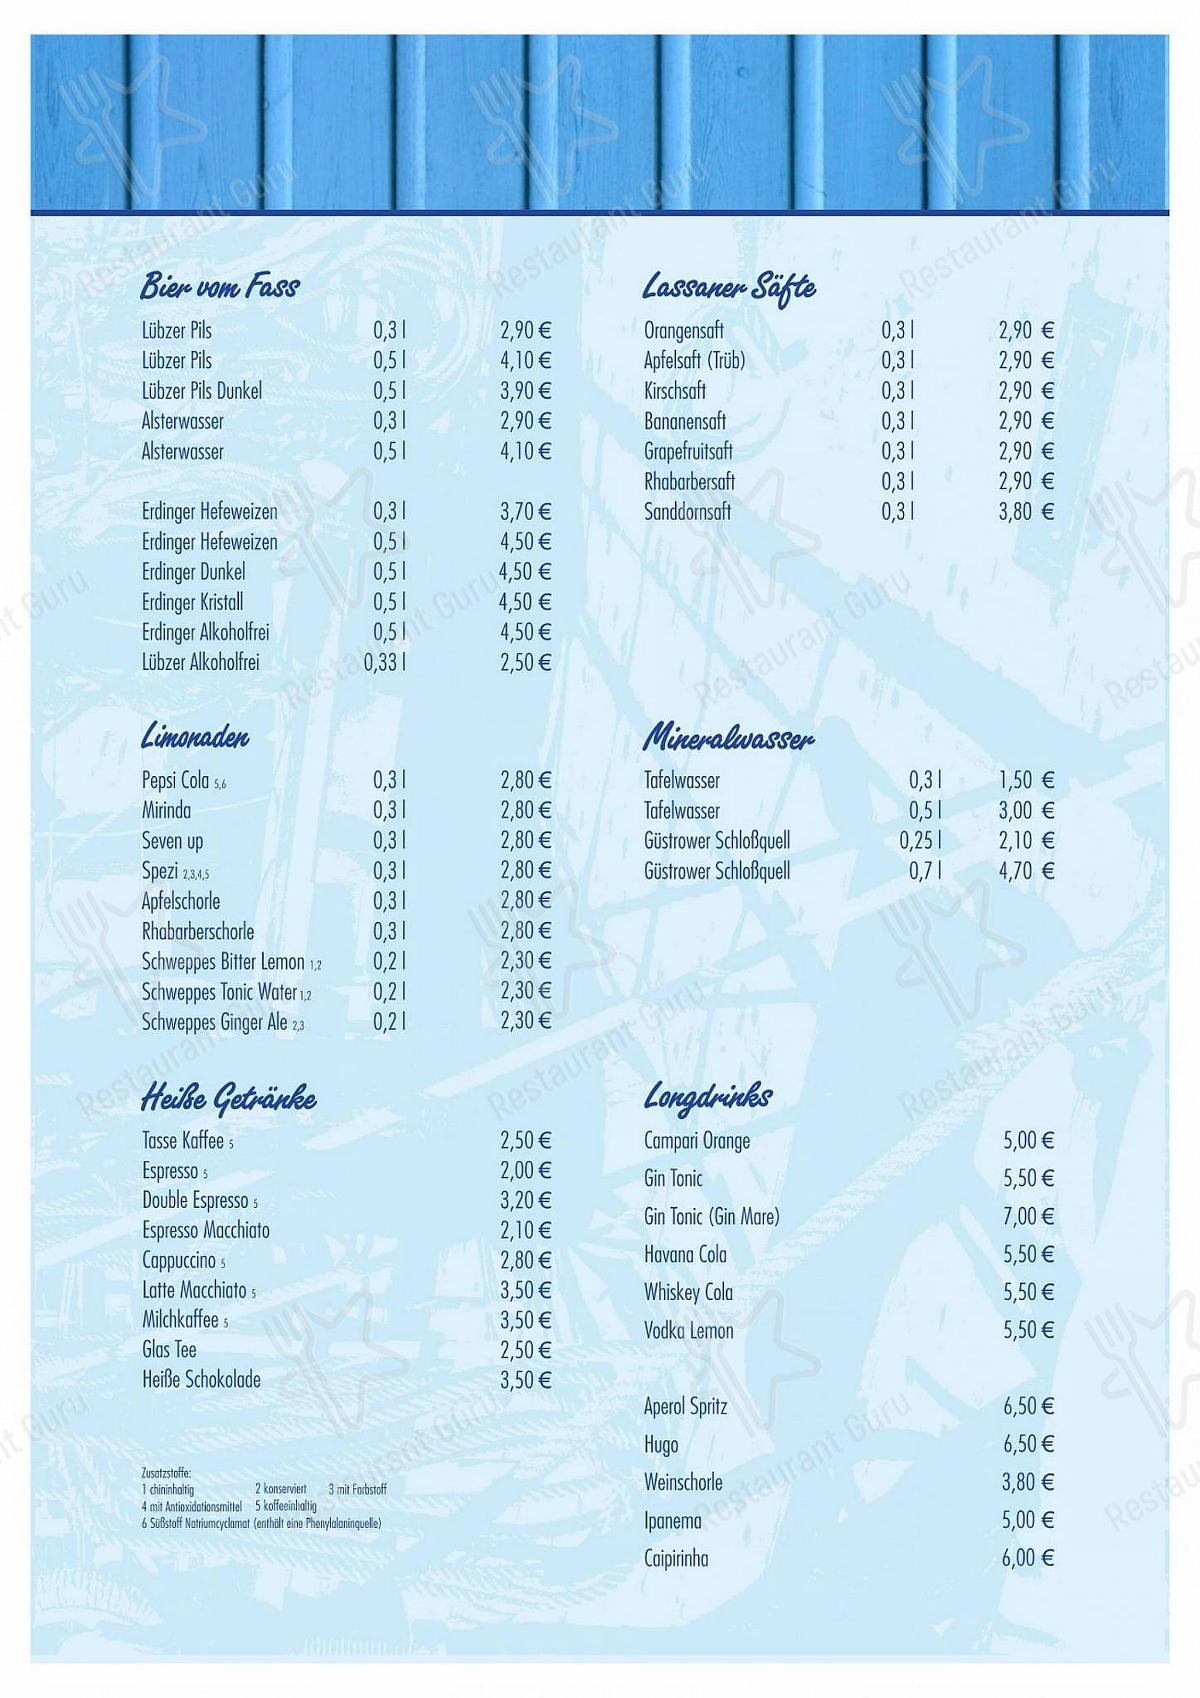 Carta de Nepperminer Fischpalast restaurante